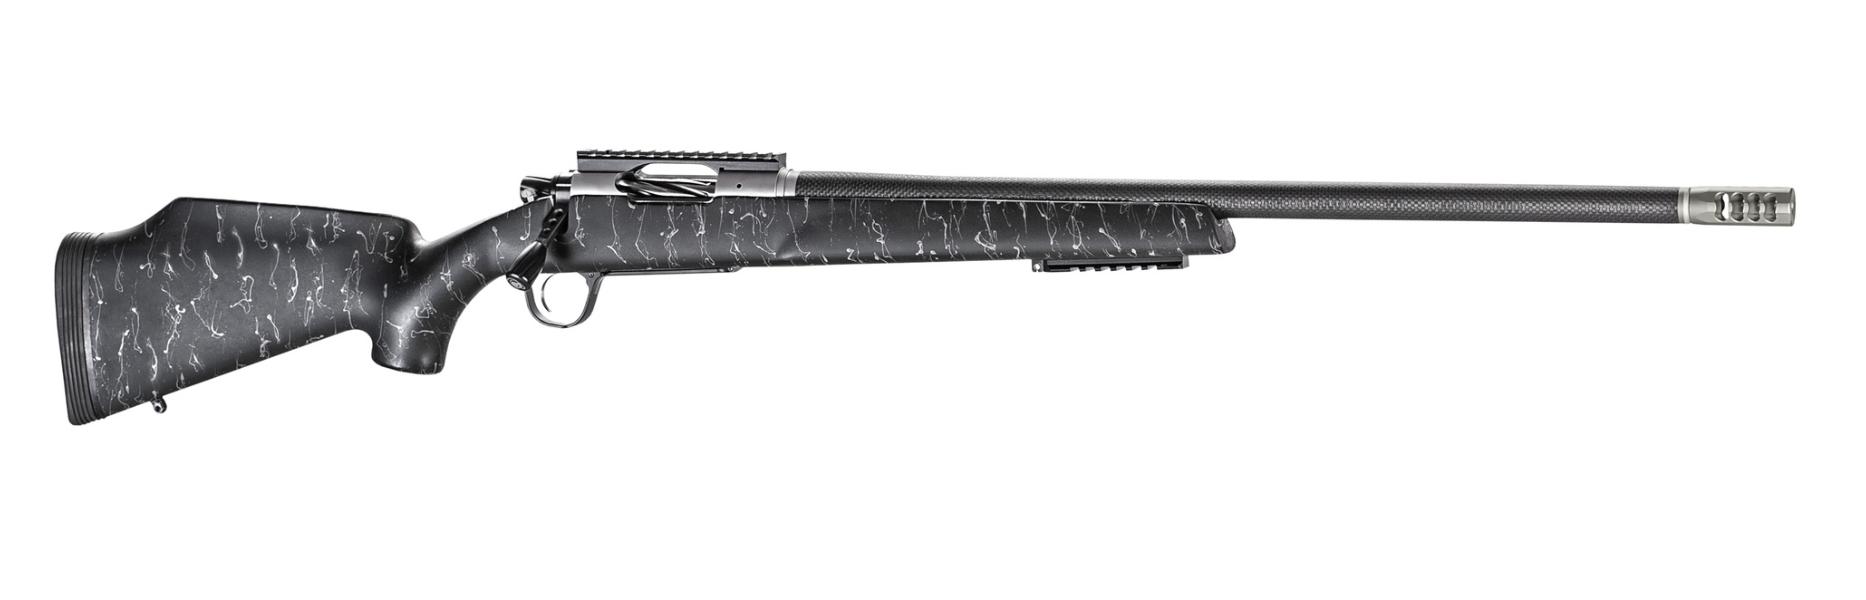 Christensen Arms Traverse 243 Win